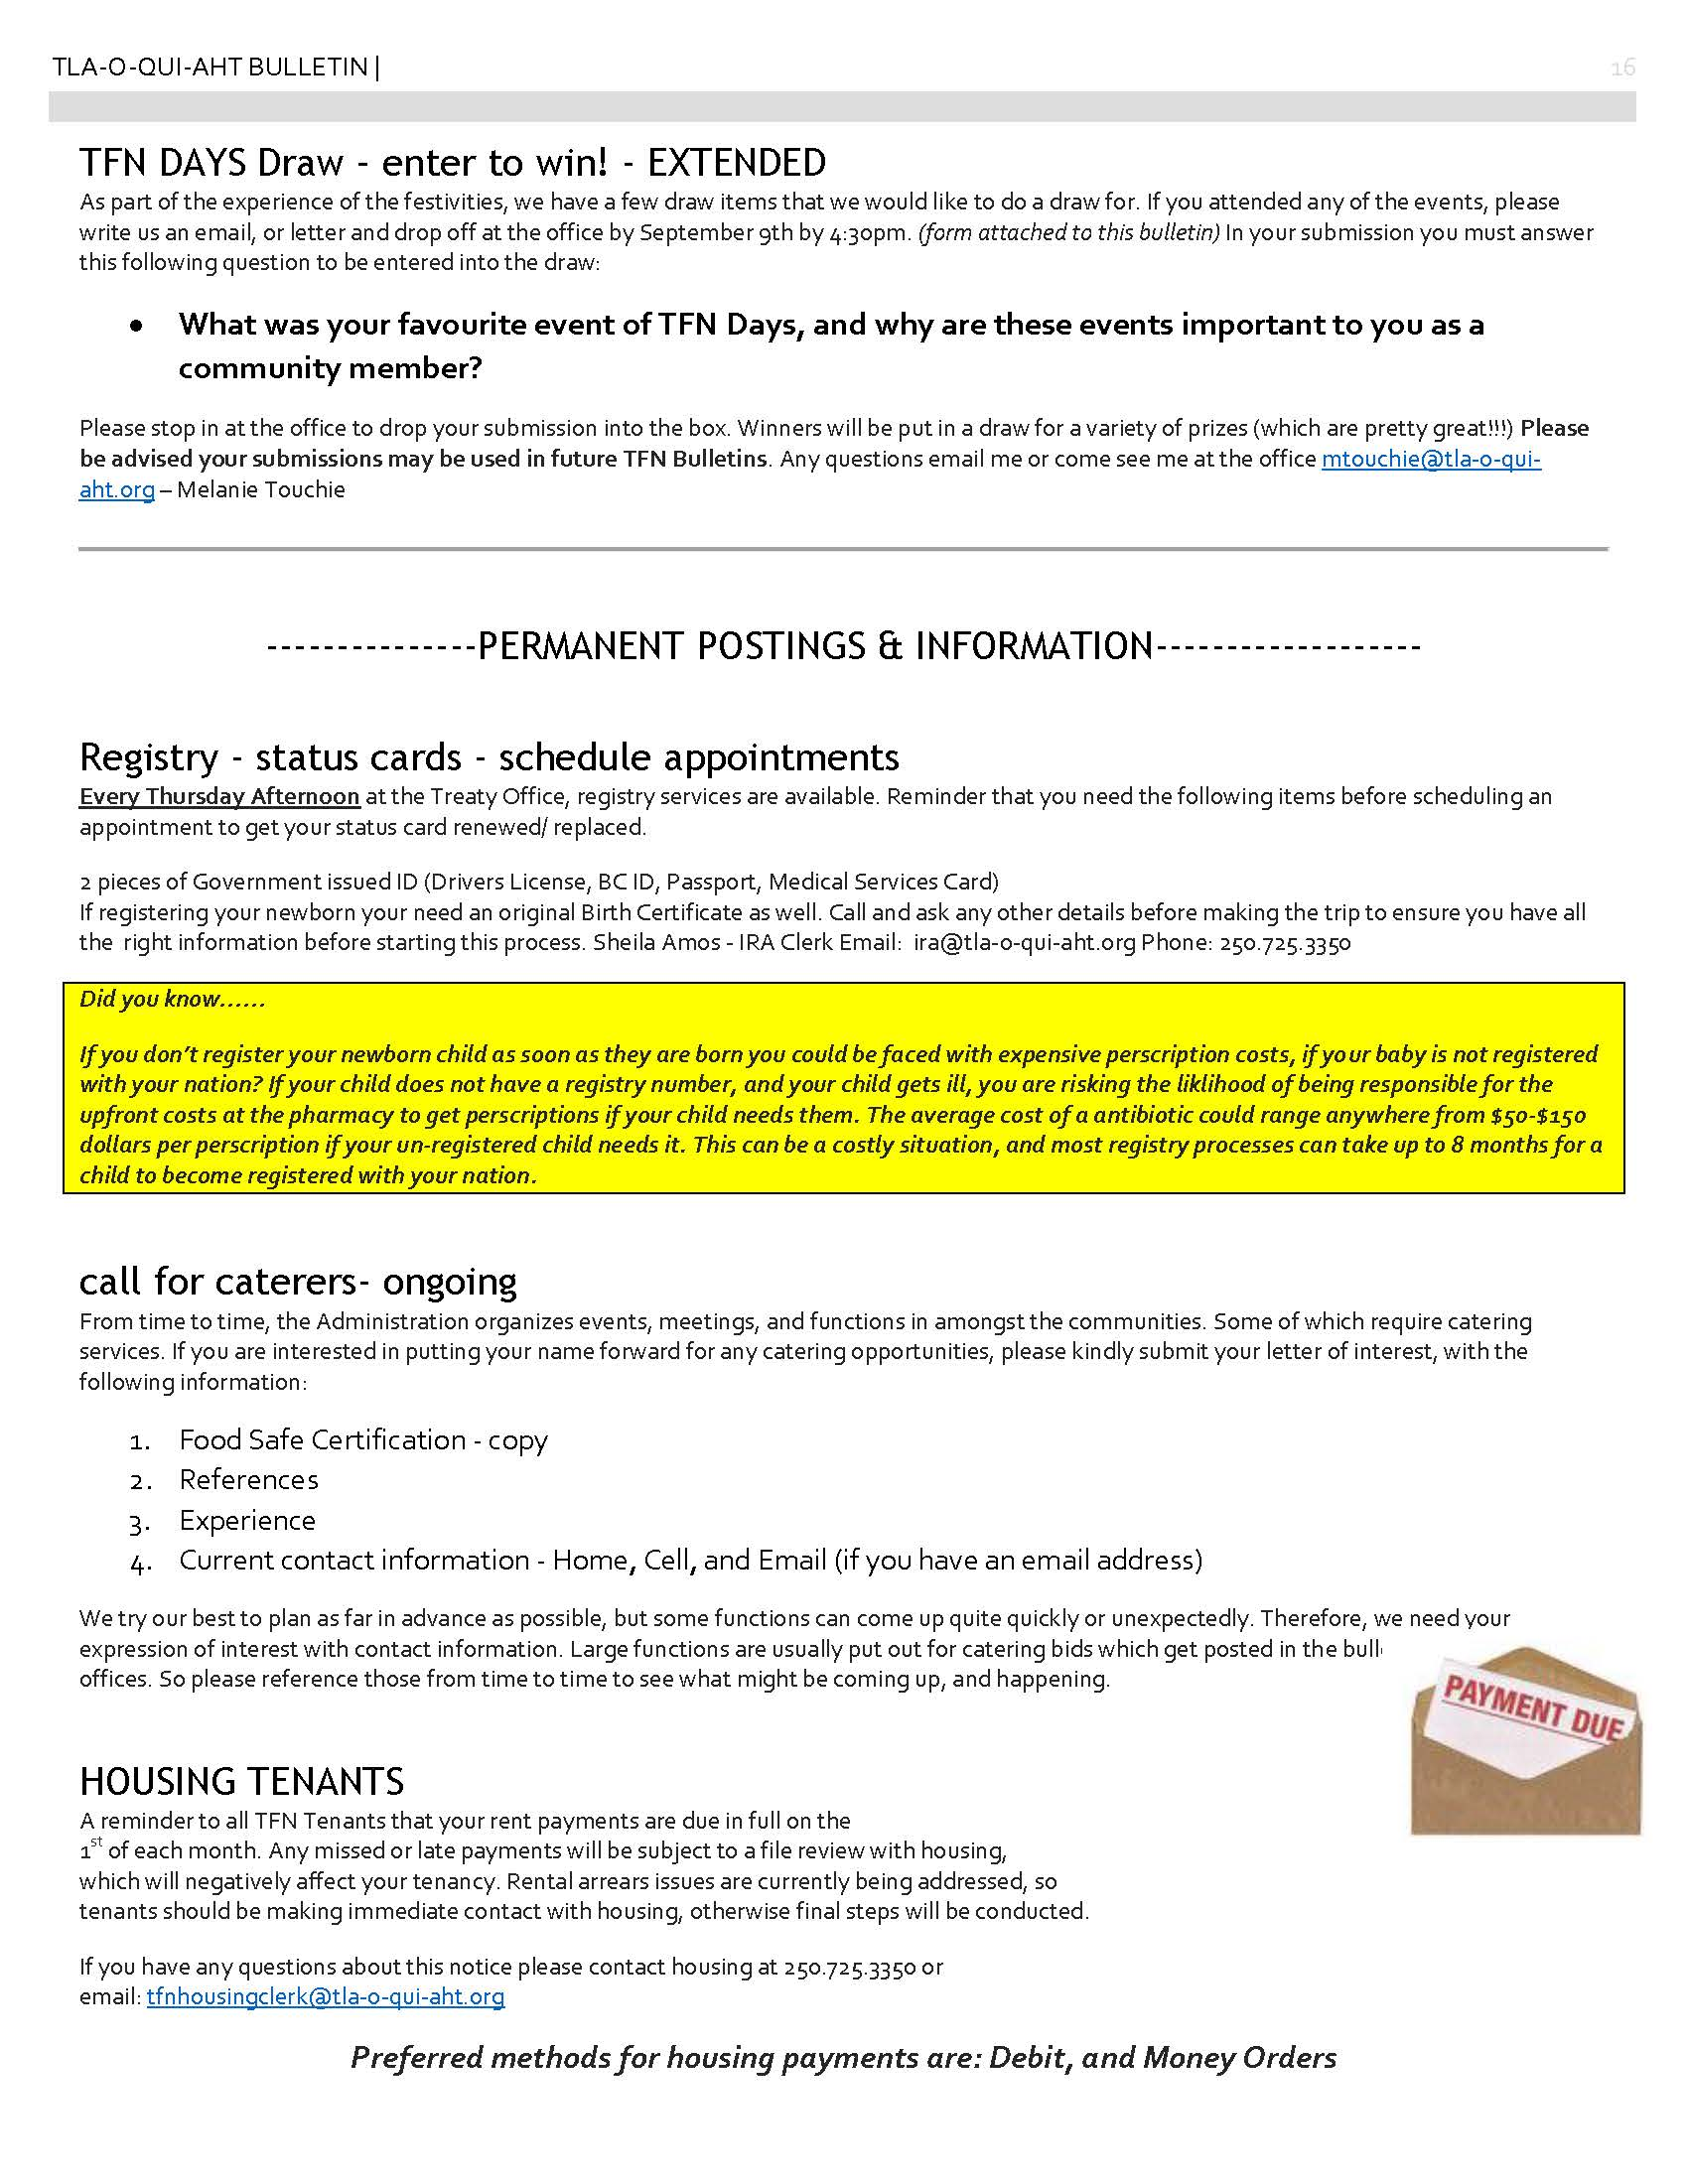 TFN Bulletin Sept 1-2016_Page_16.jpg